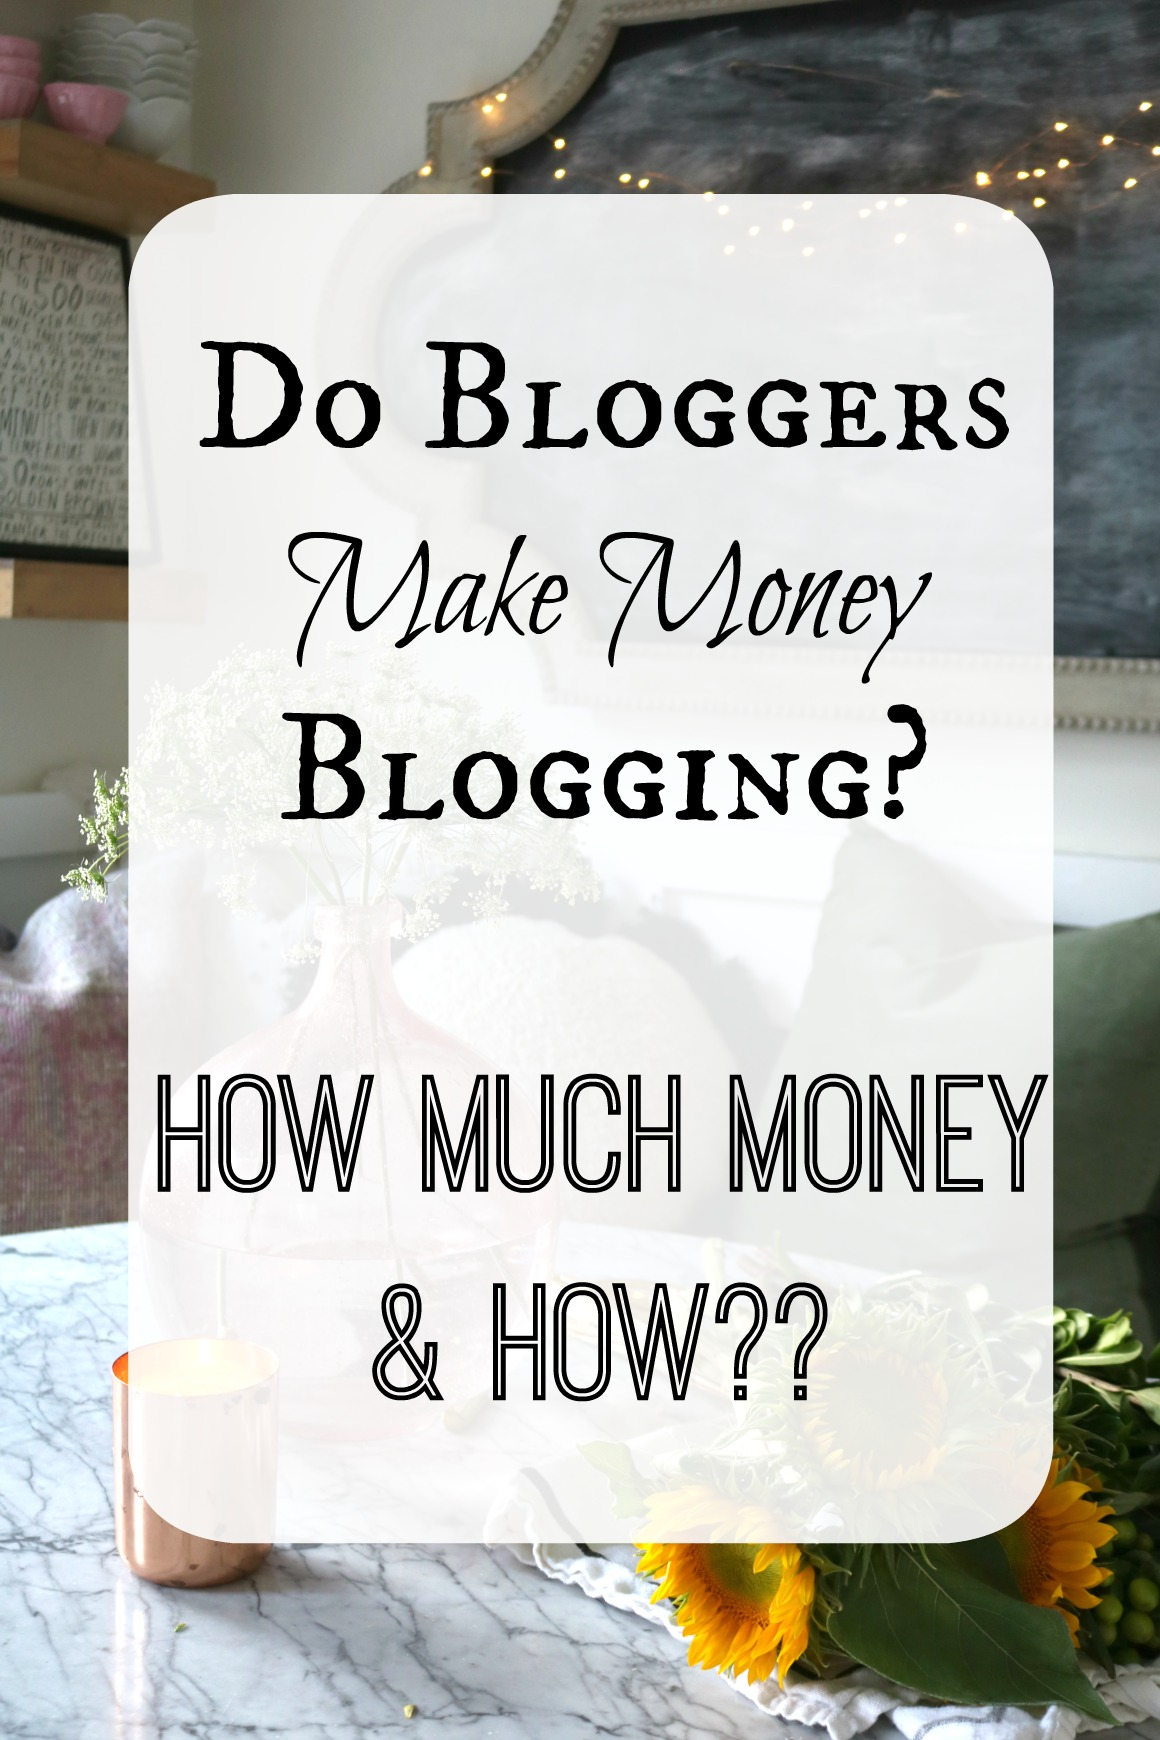 Blogging for Money- How Bloggers Make Money